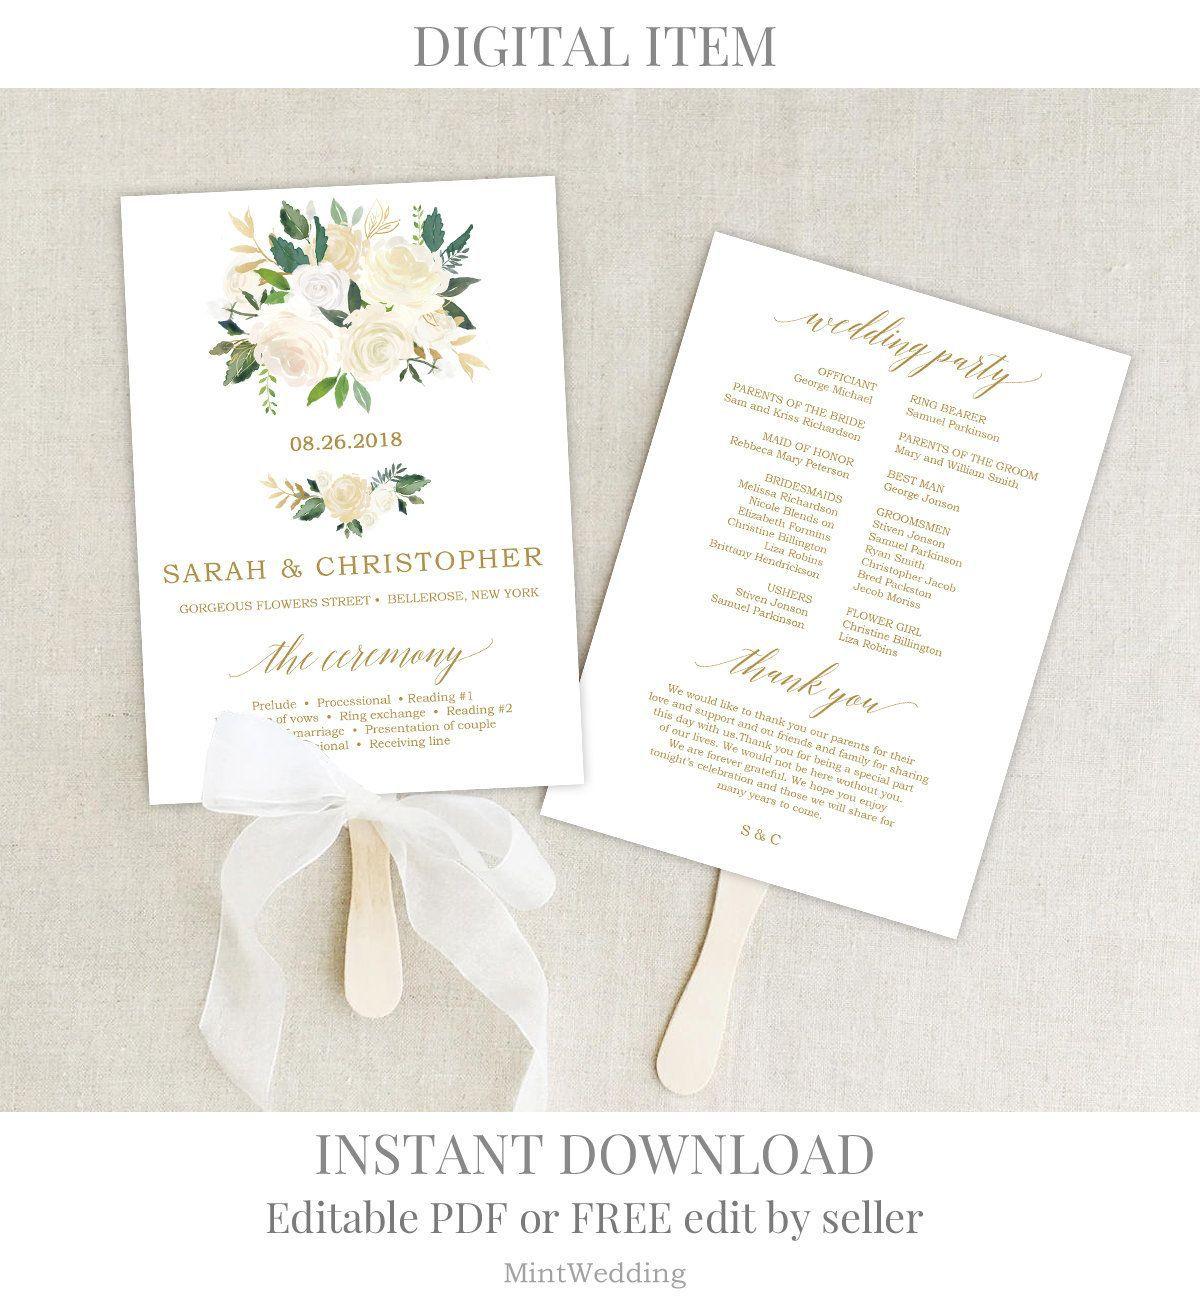 001 Rare Wedding Program Template Free Download High Def  Downloadable Pdf Reception Microsoft Word FanFull